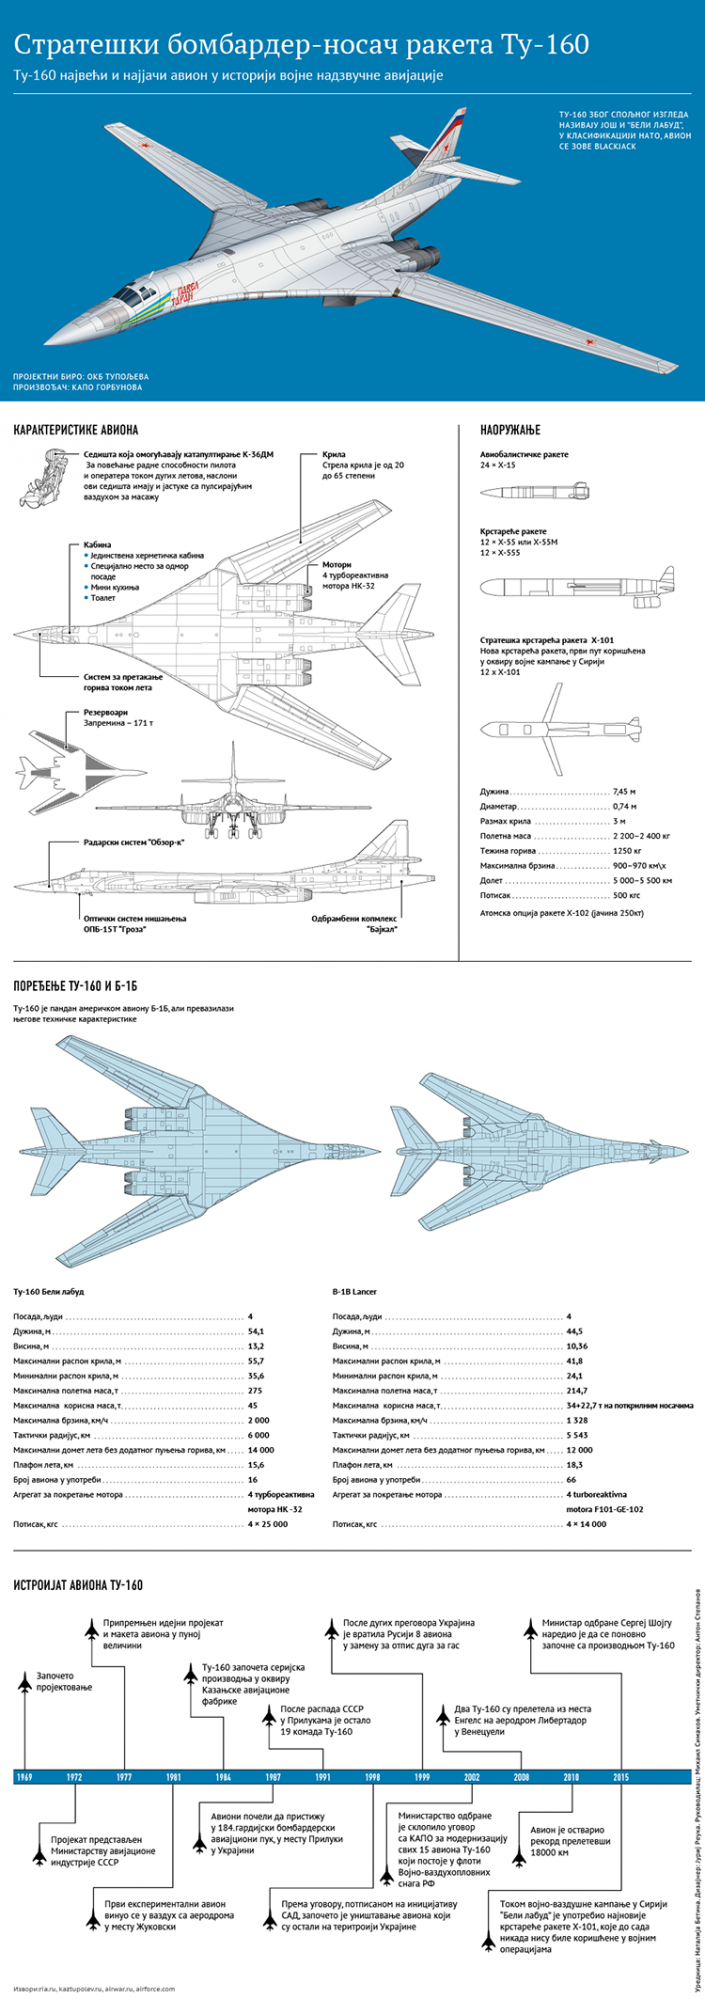 Ruski bombarder skica